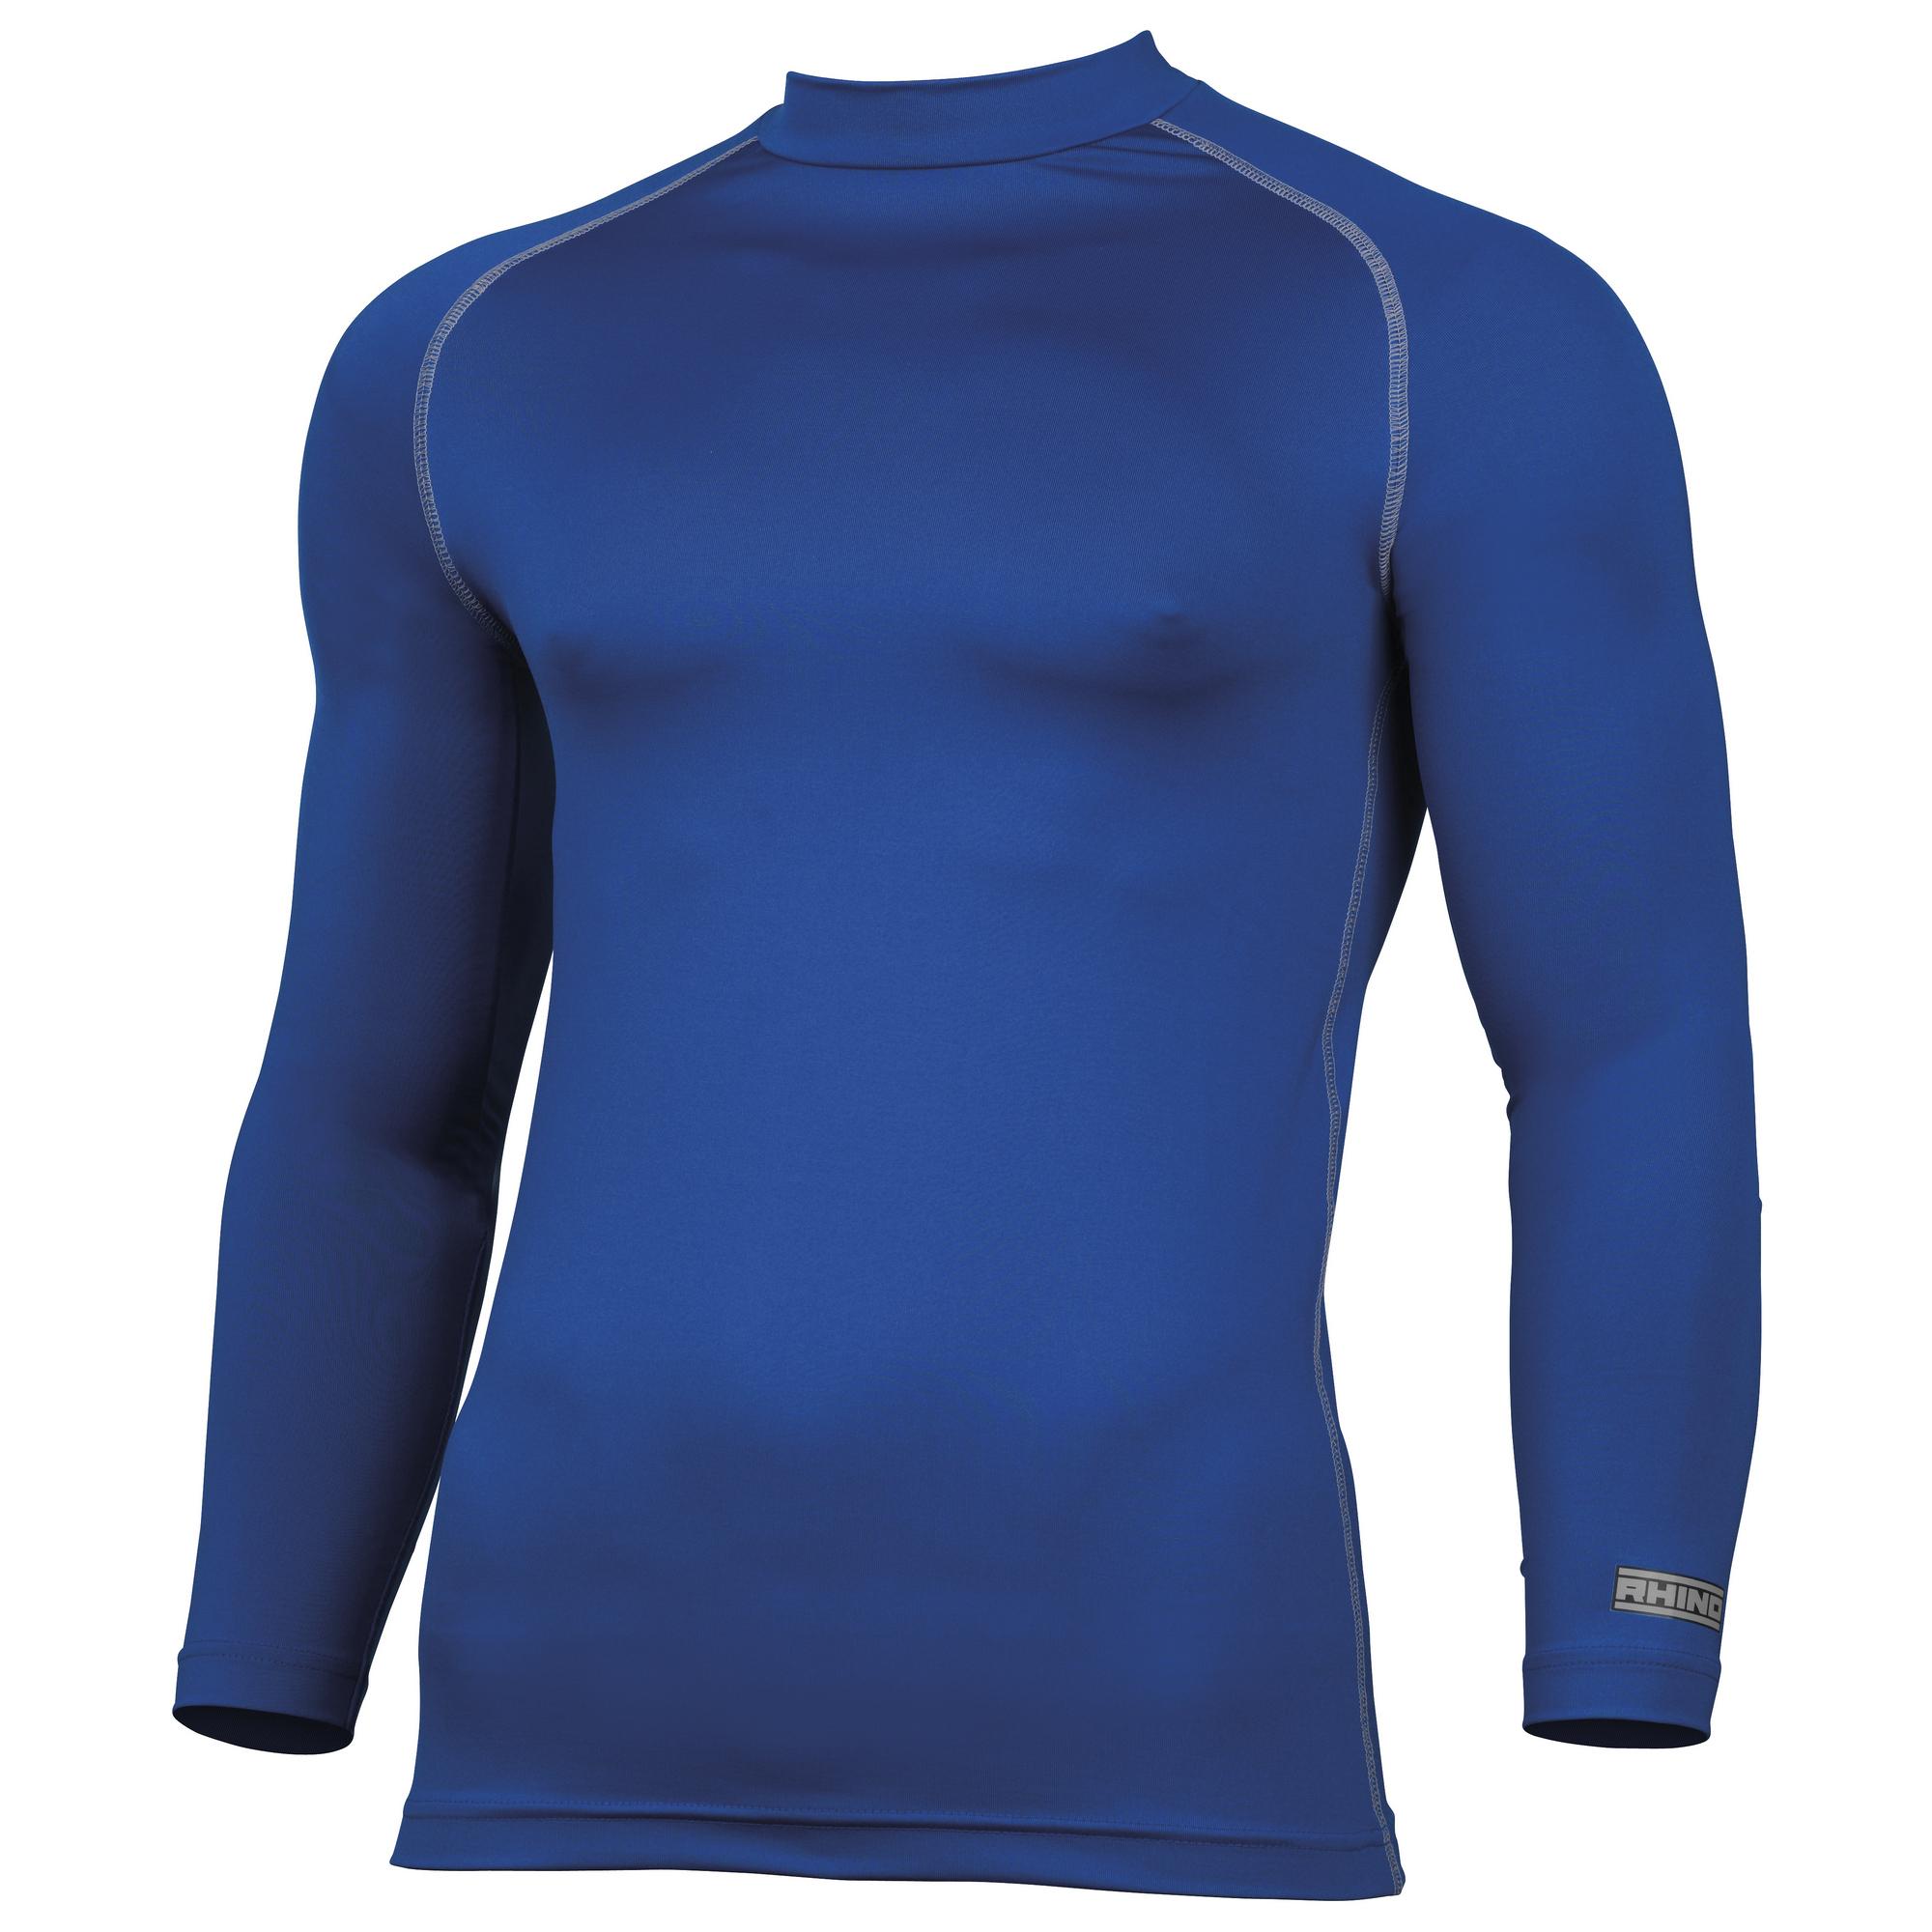 Rhino Mens Thermal Underwear Long Sleeve Base Layer Vest Top (L/XL) (Royal)